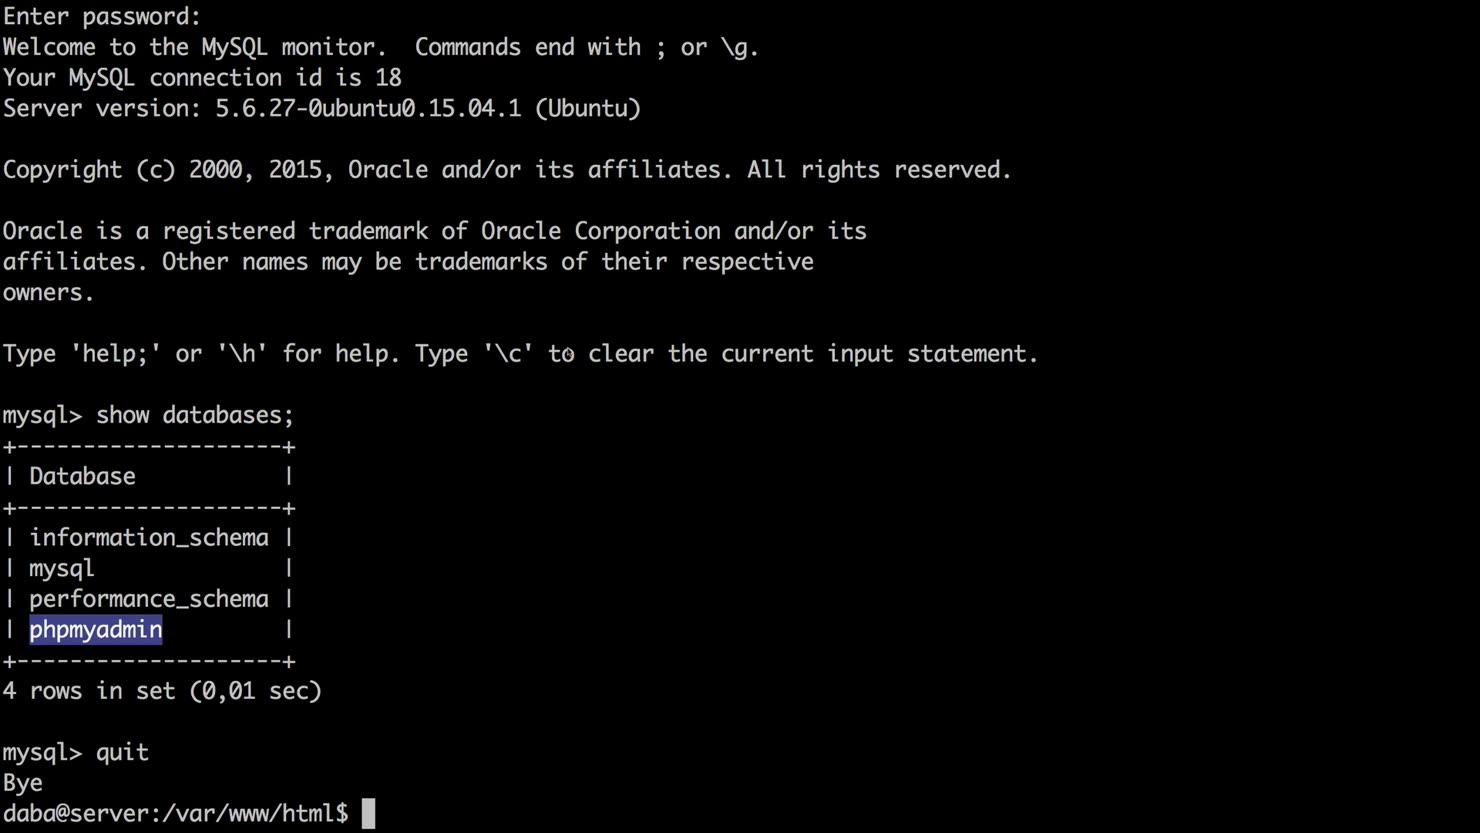 Installer og opsæt Apache, PHP, MySQL og phpmyadmin